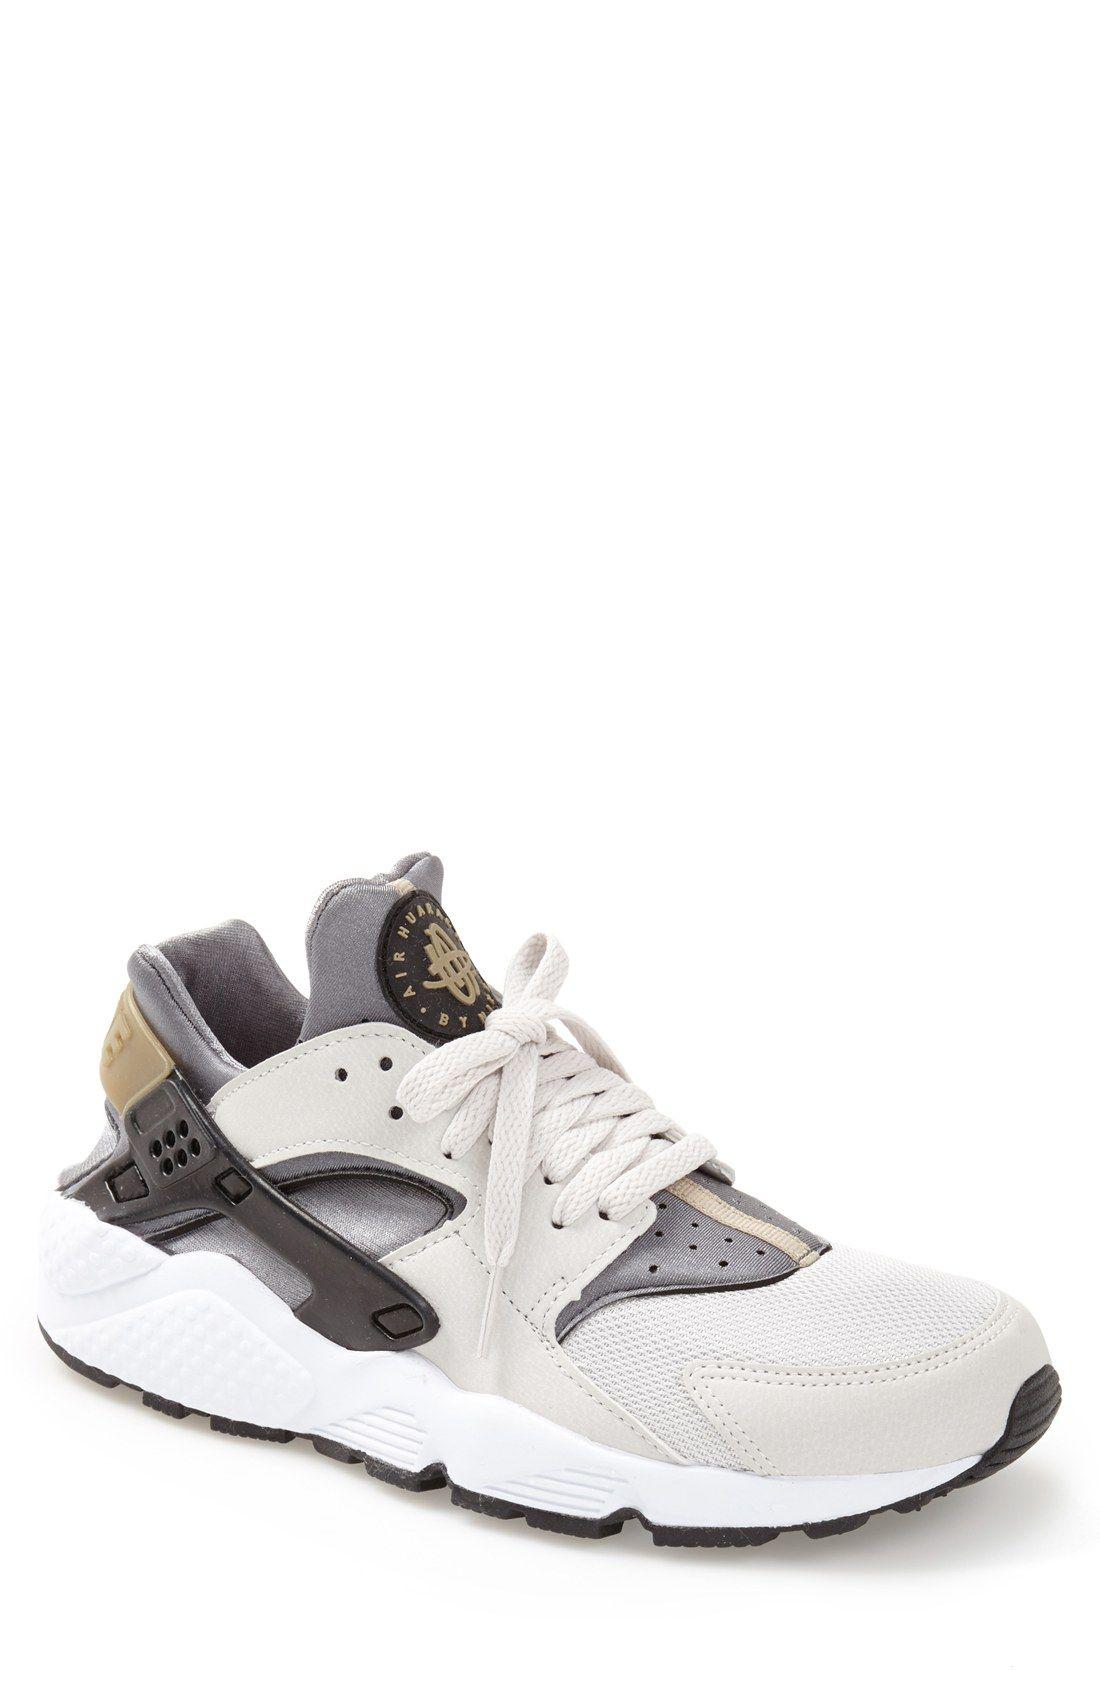 Nike Air Huarache Sneaker Men Nordstrom Sneakers Men Fashion Sneakers Men Mens Nike Shoes